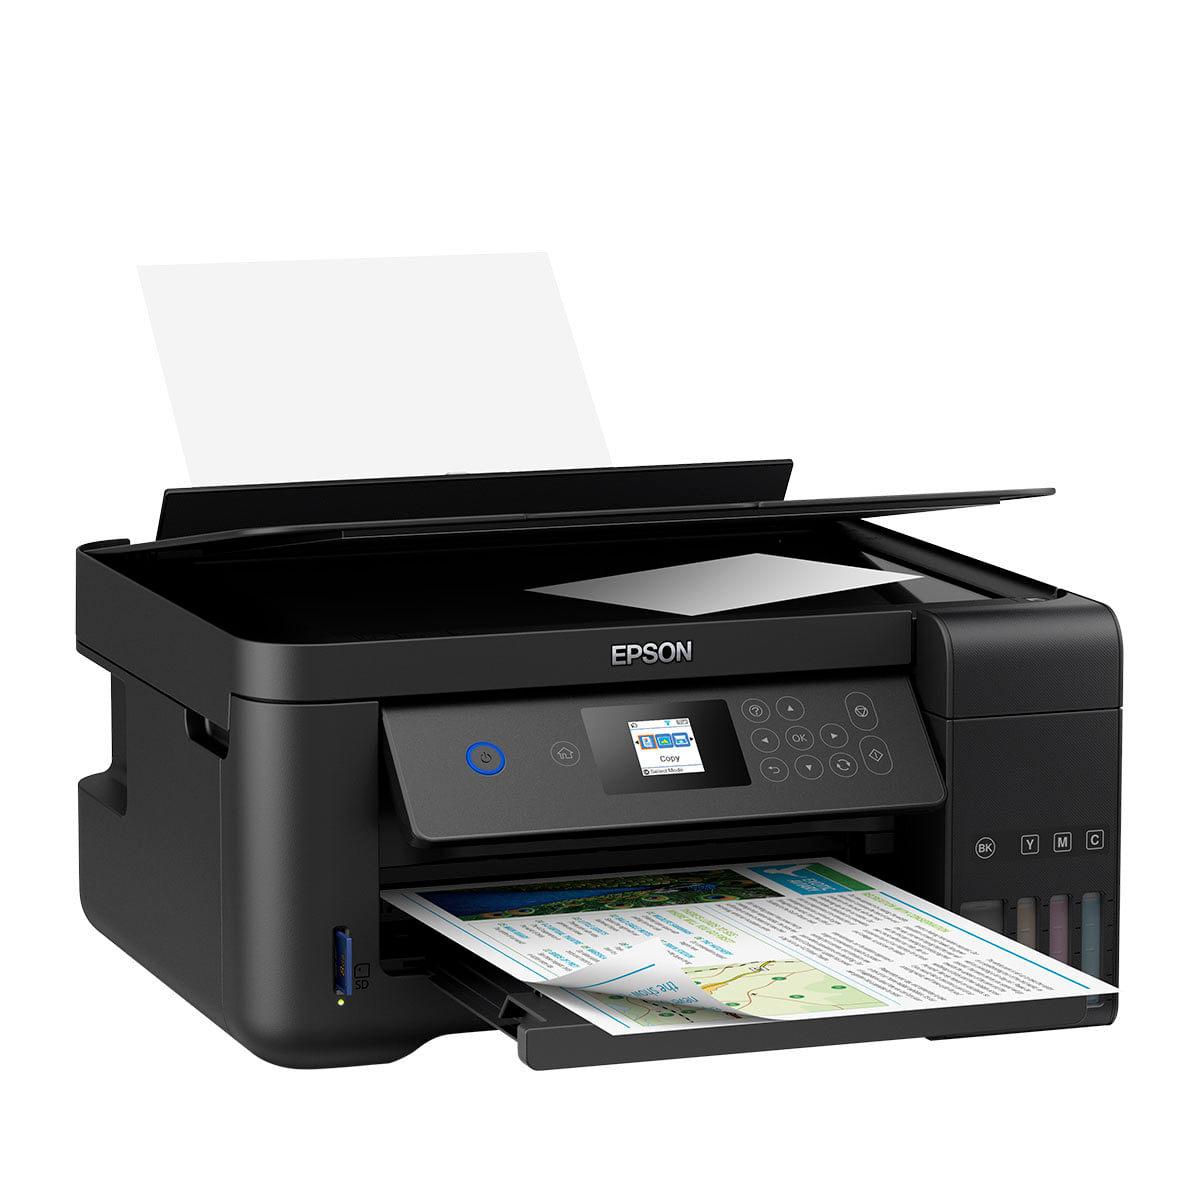 Impressora Multifuncional Epson EcoTank L4160 com tinta Pigmentada  - ECONOMIZOU